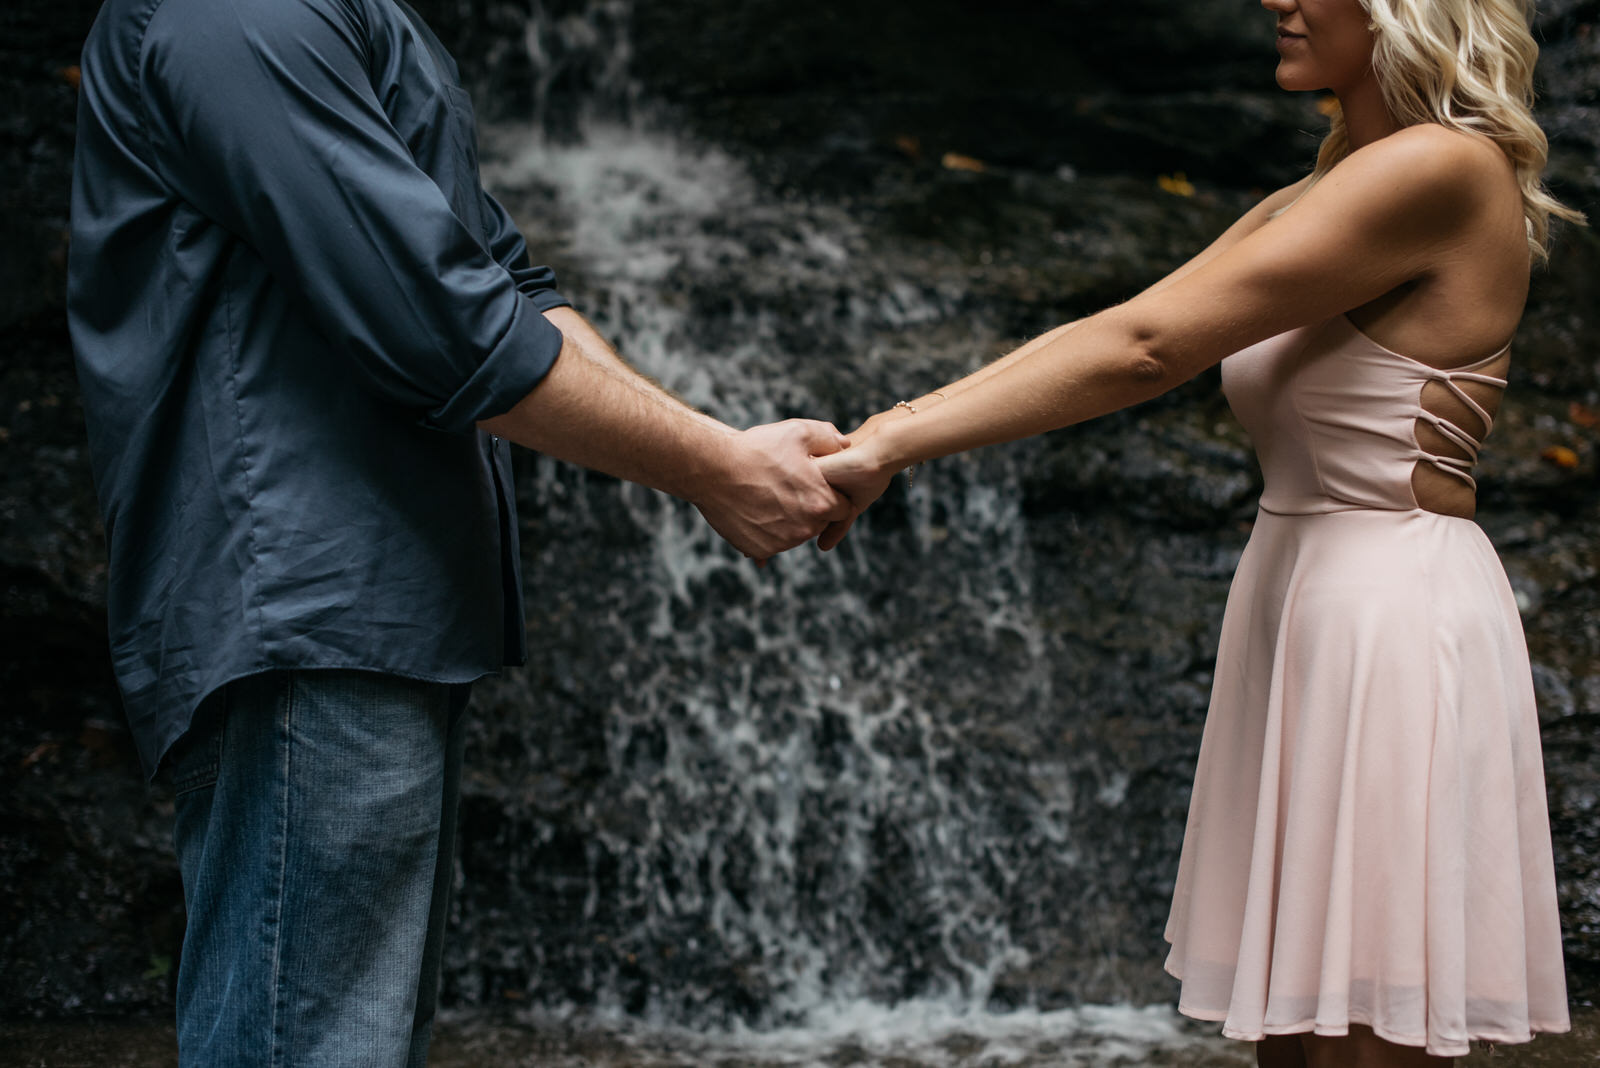 McConnells-Mill-Engagement-Photos-11.jpg